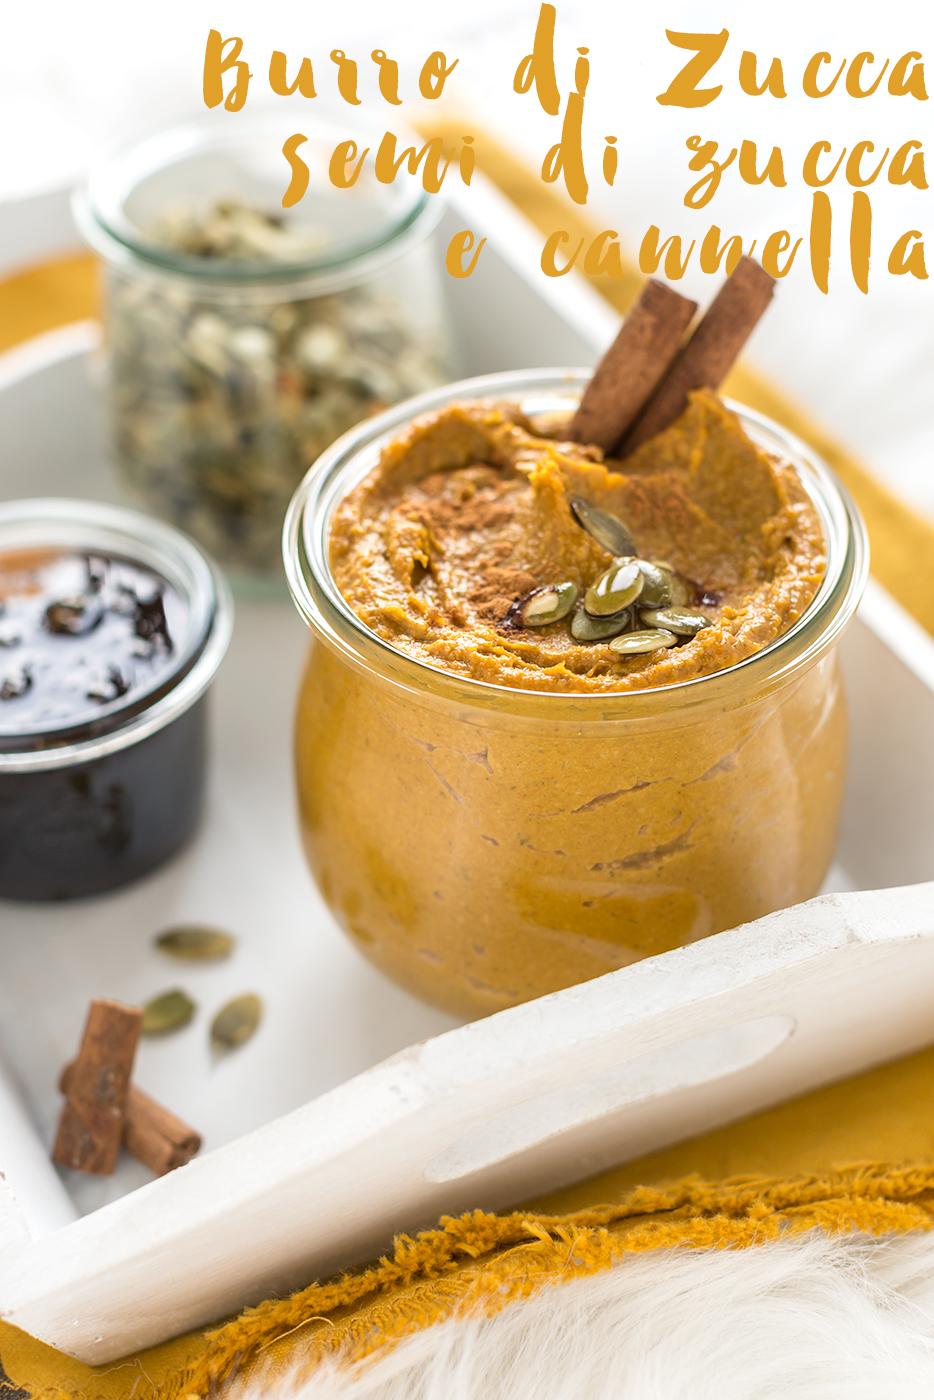 Christmas gift idea vegan pumpkin cinnamon butter - burro di zucca semi di zucca e cannella vegan senza zucchero idea diy natale ricetta